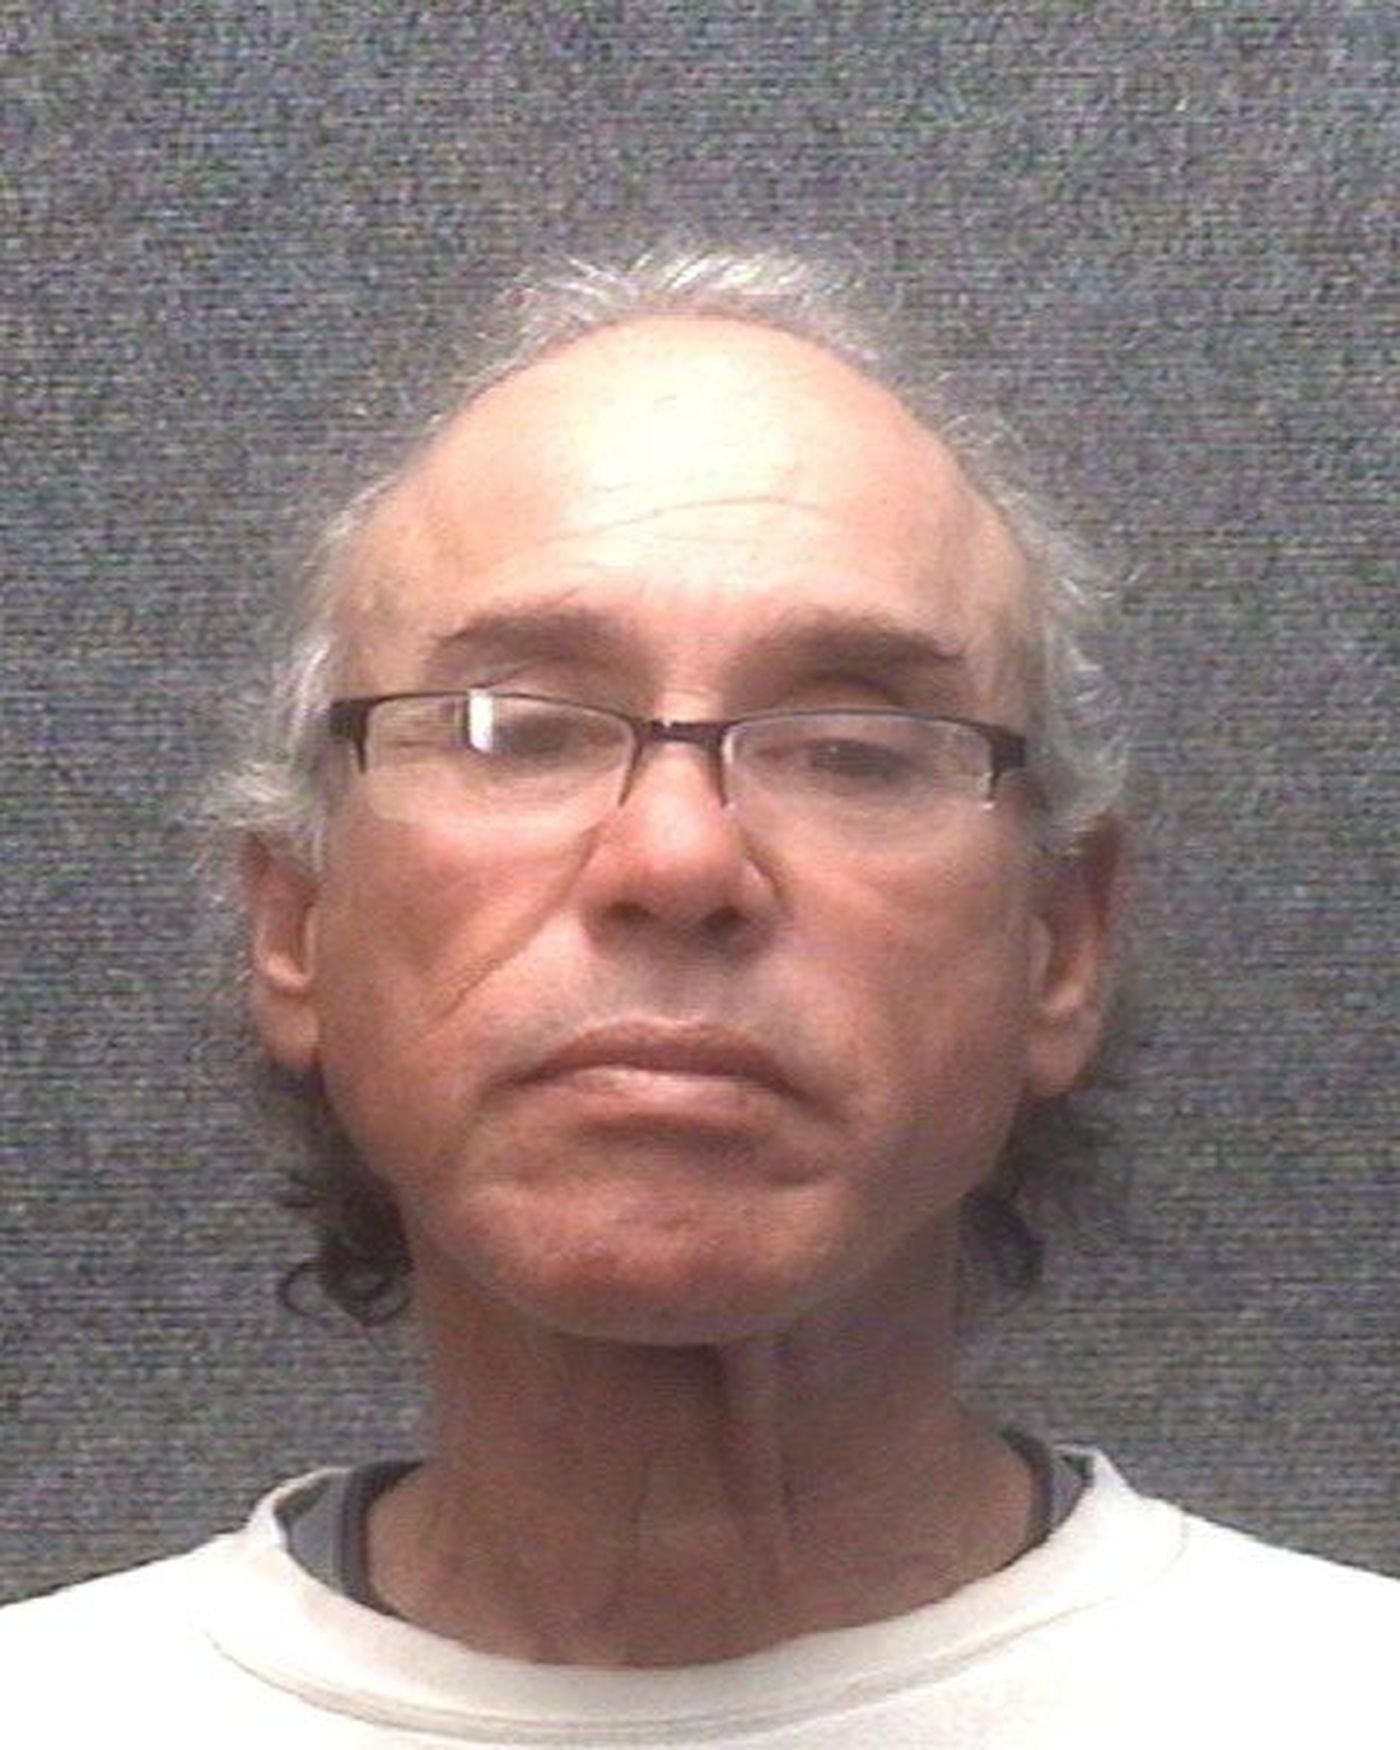 Reynaldo Cruz Source Myrtle Beach Police